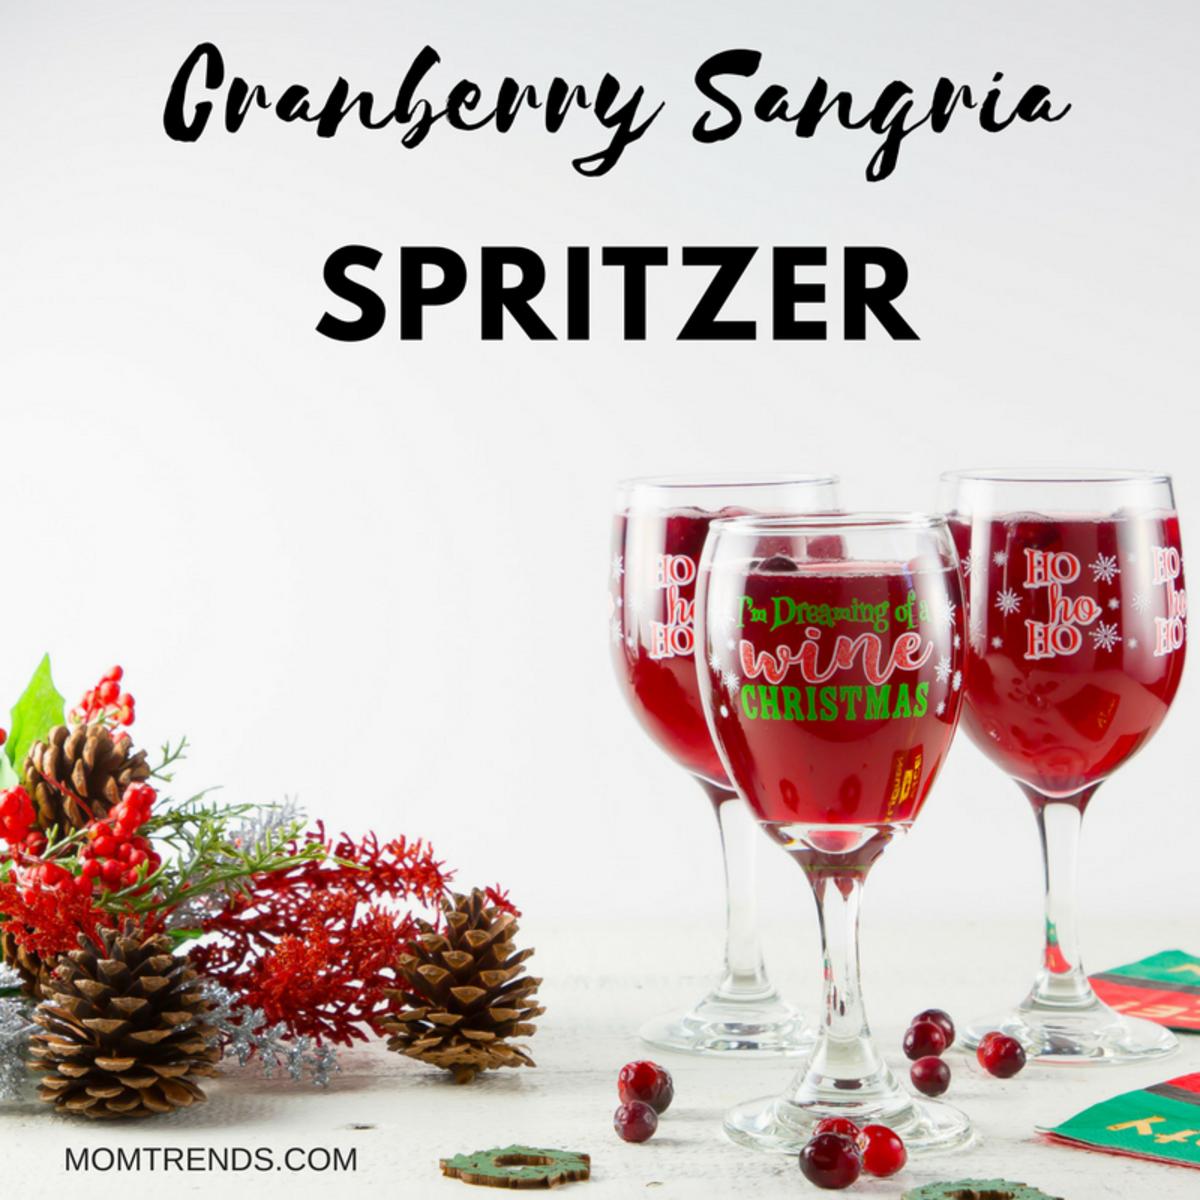 Cranberry Sangria Spritzer